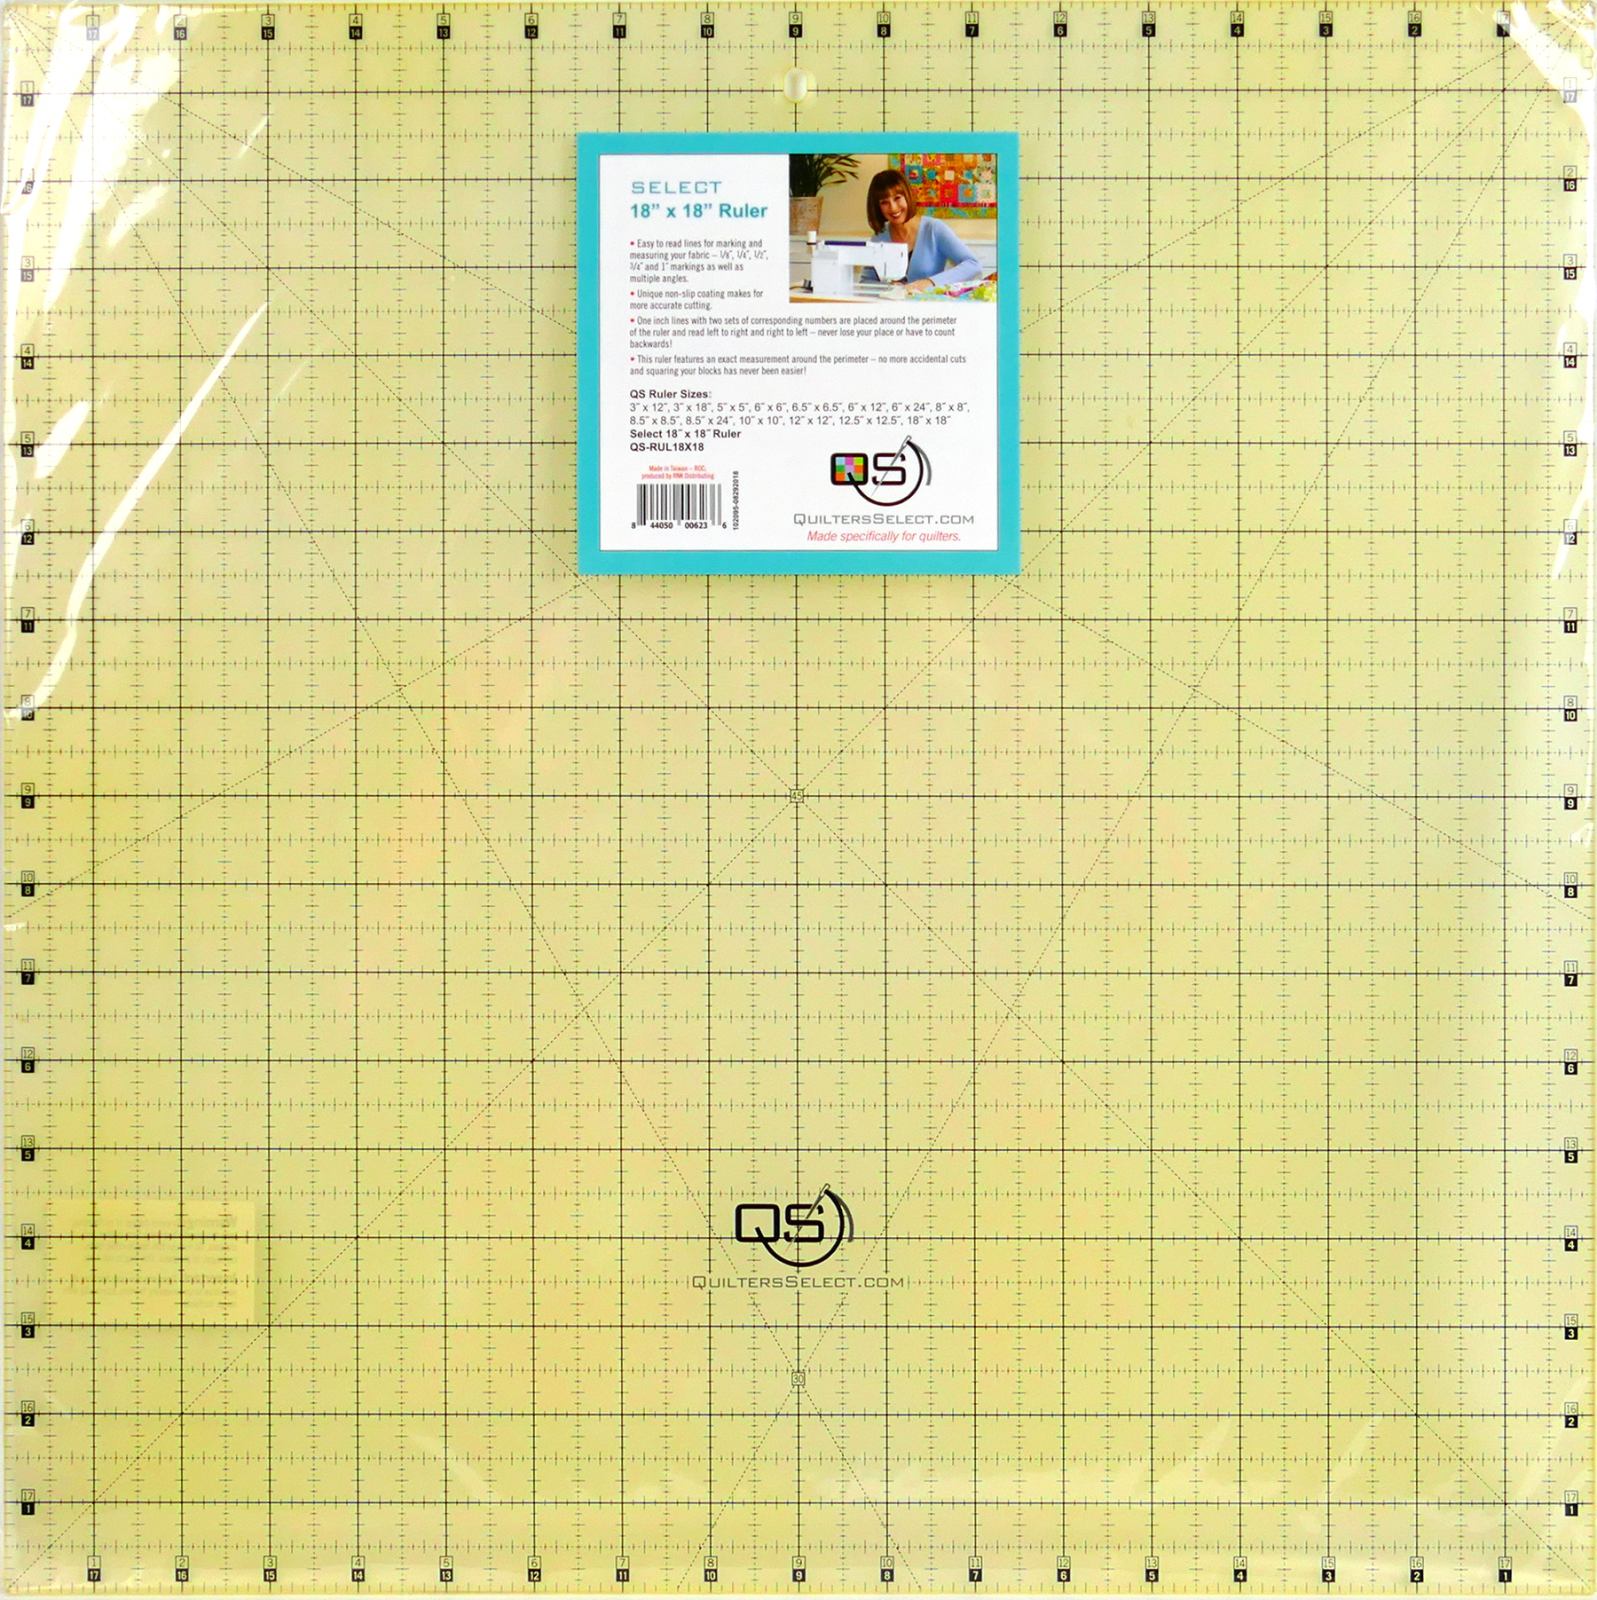 QS Select 18 x 18 Non-Slip Ruler